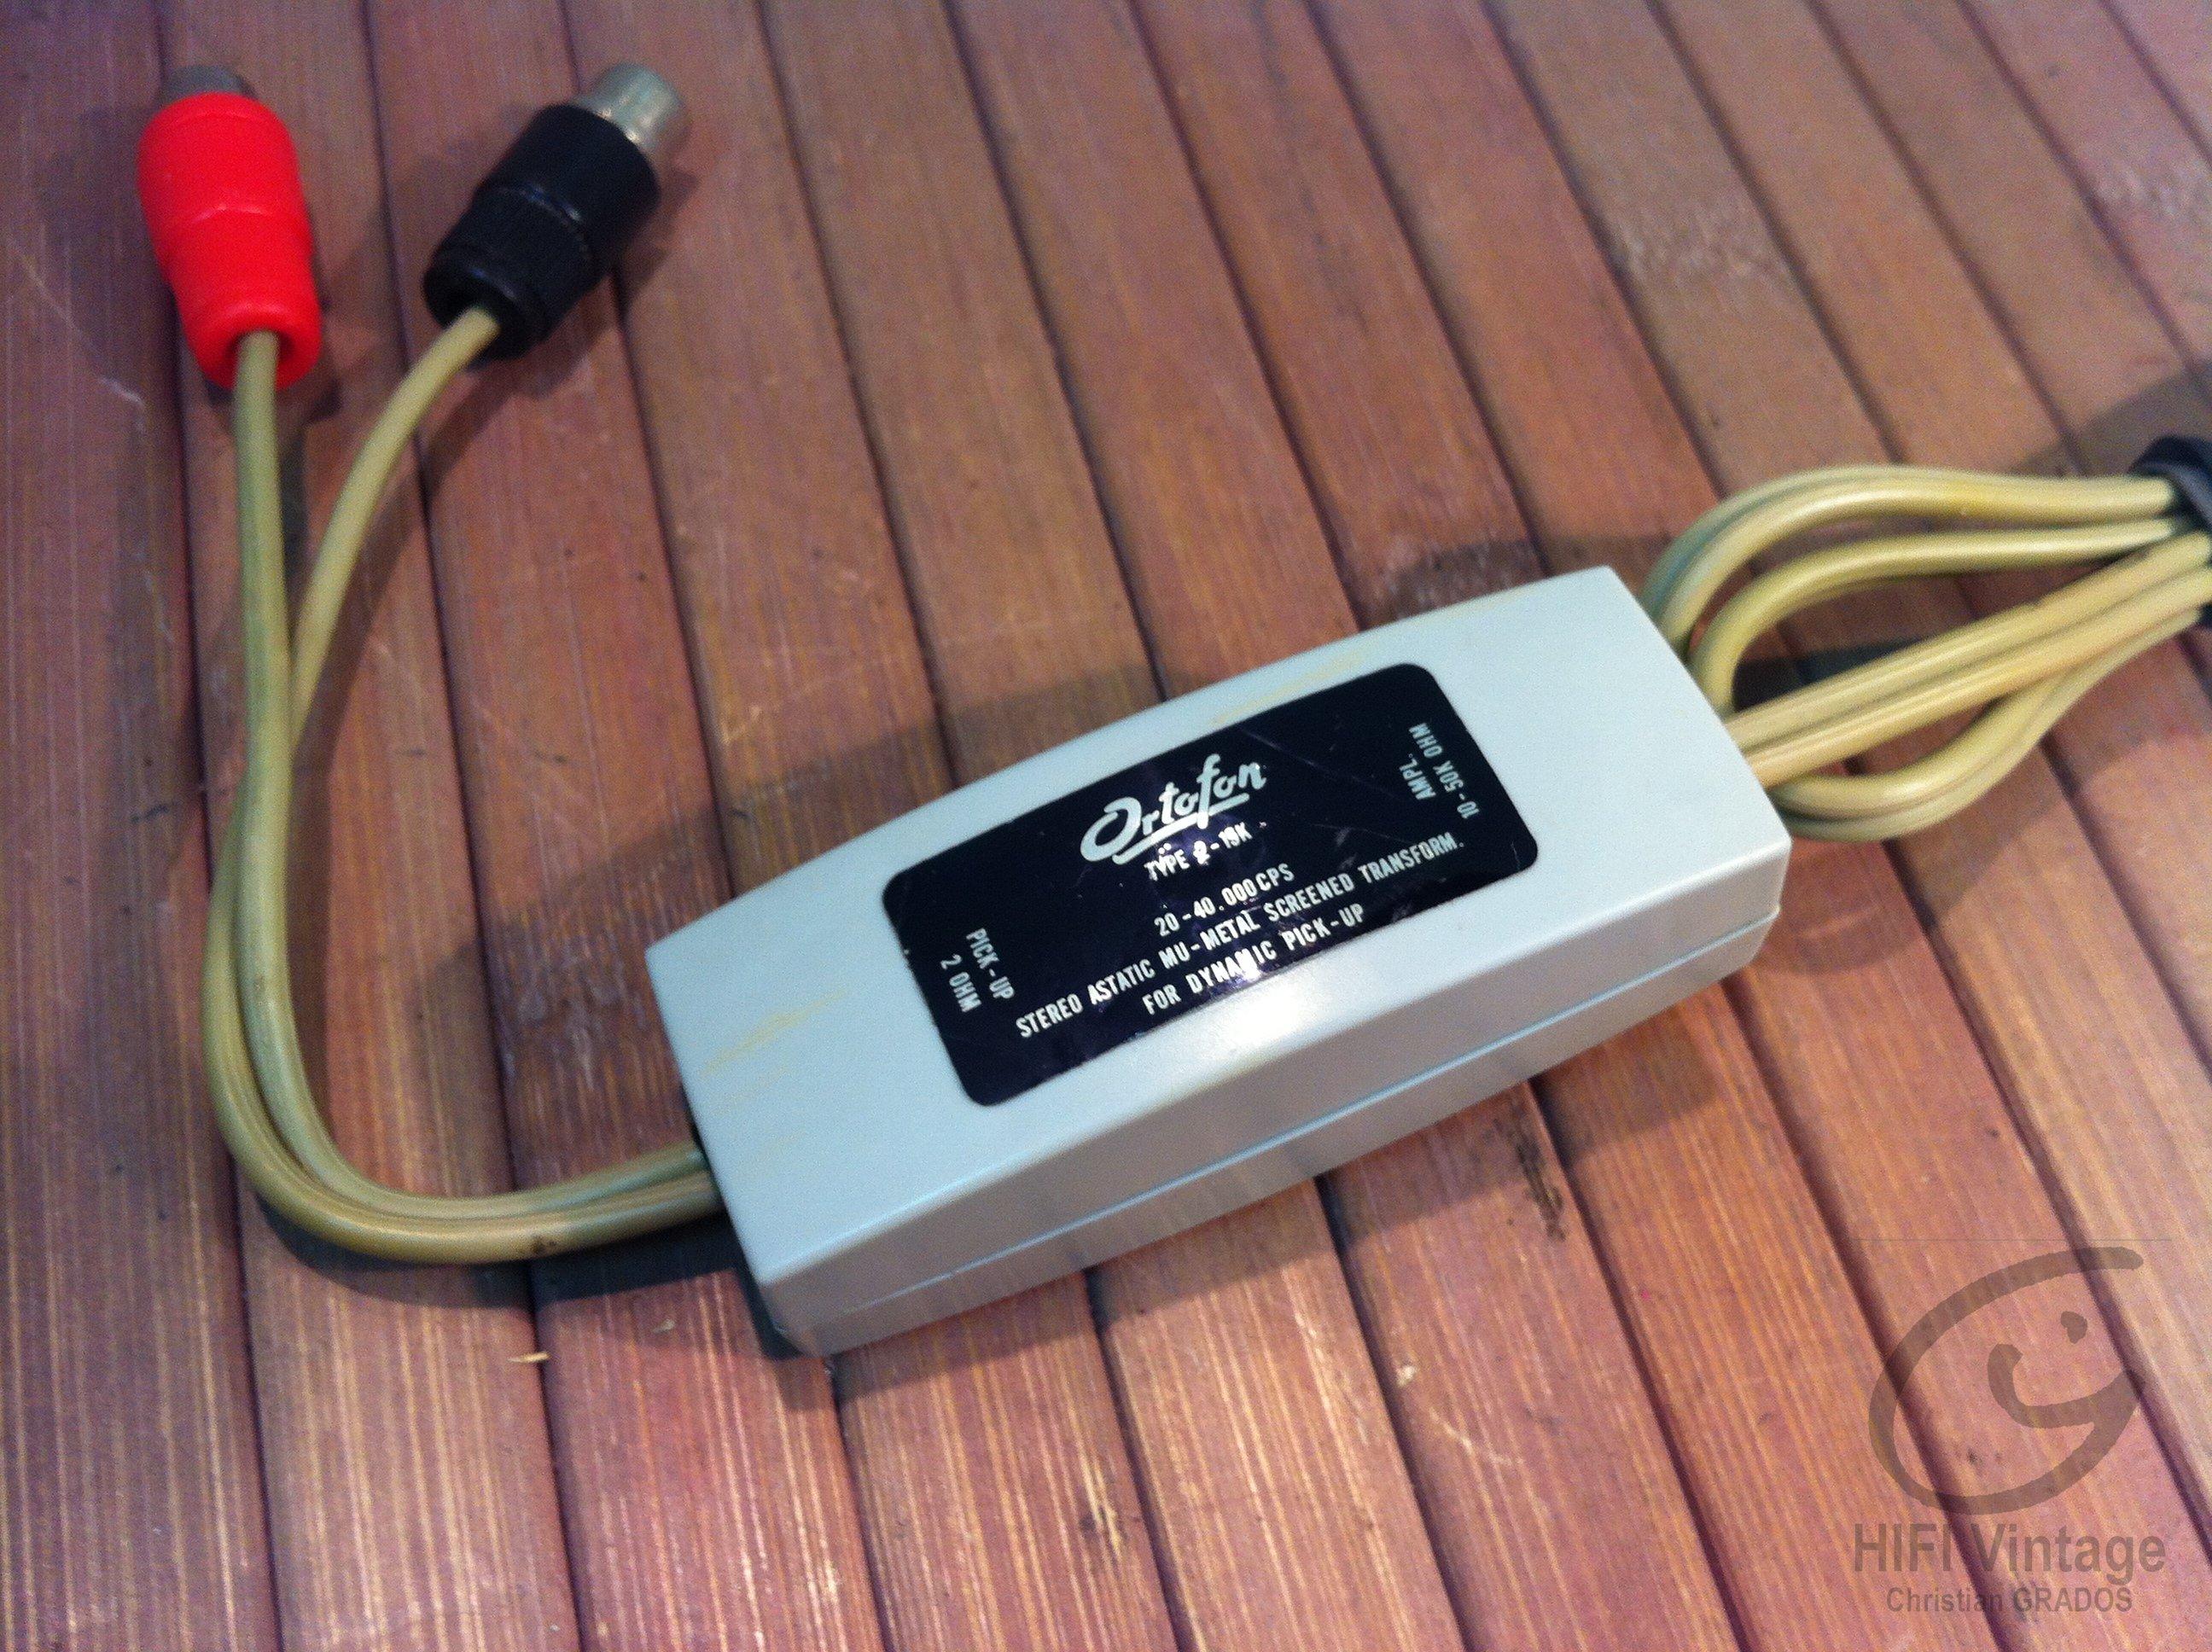 Ortofon Type 2-15K préampli Phono MC Hifi vintage réparations